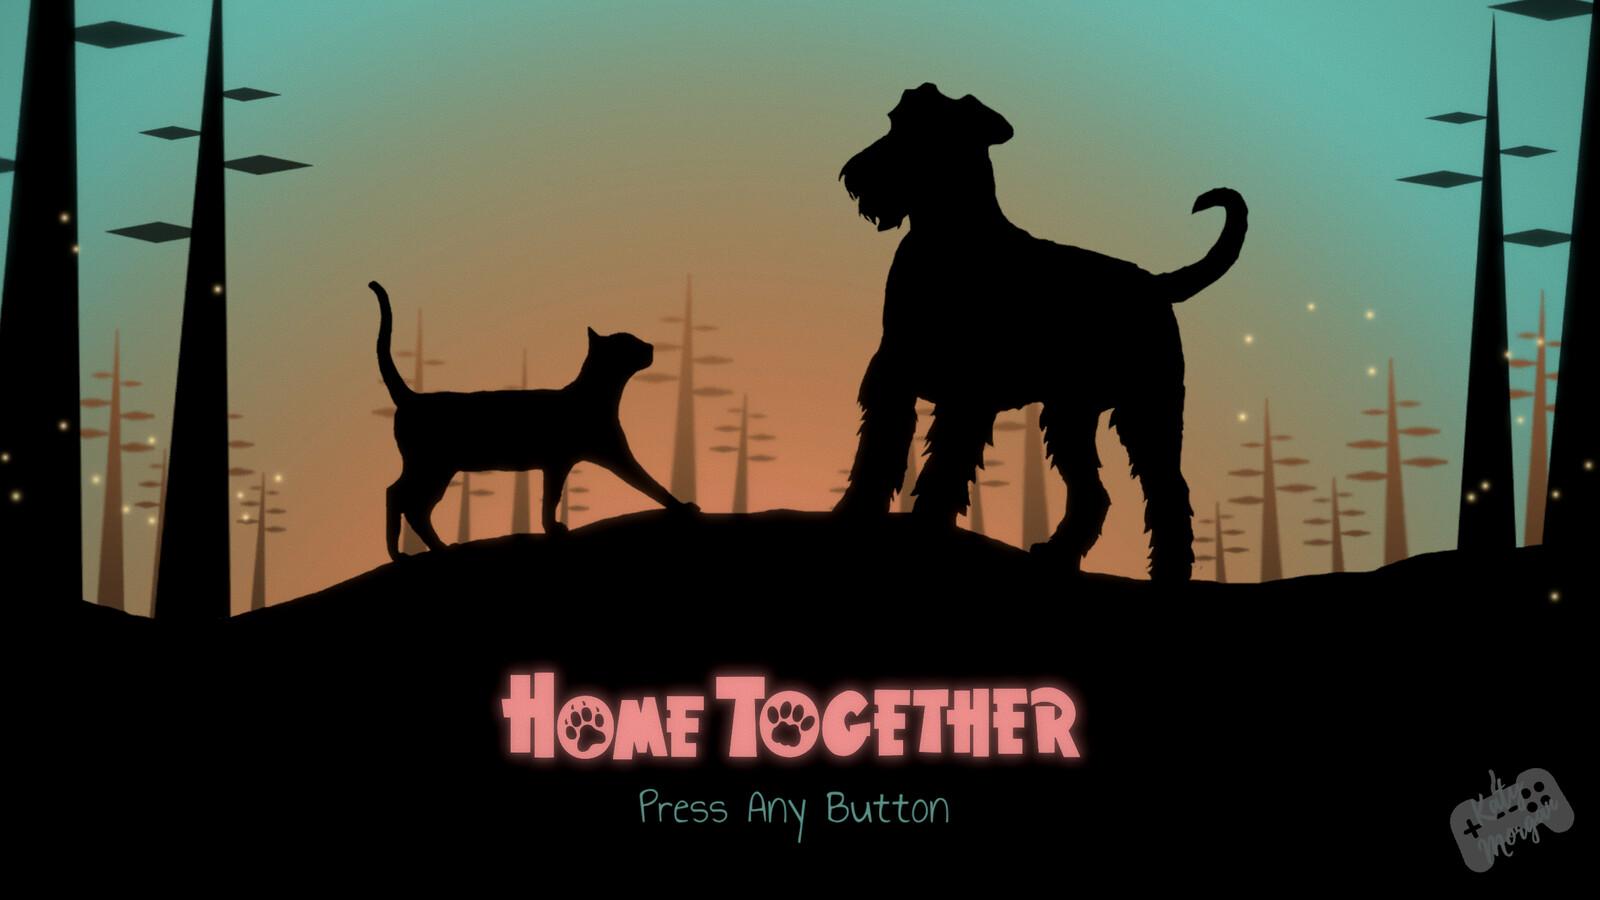 Home Together Menu - Made with Photoshop.